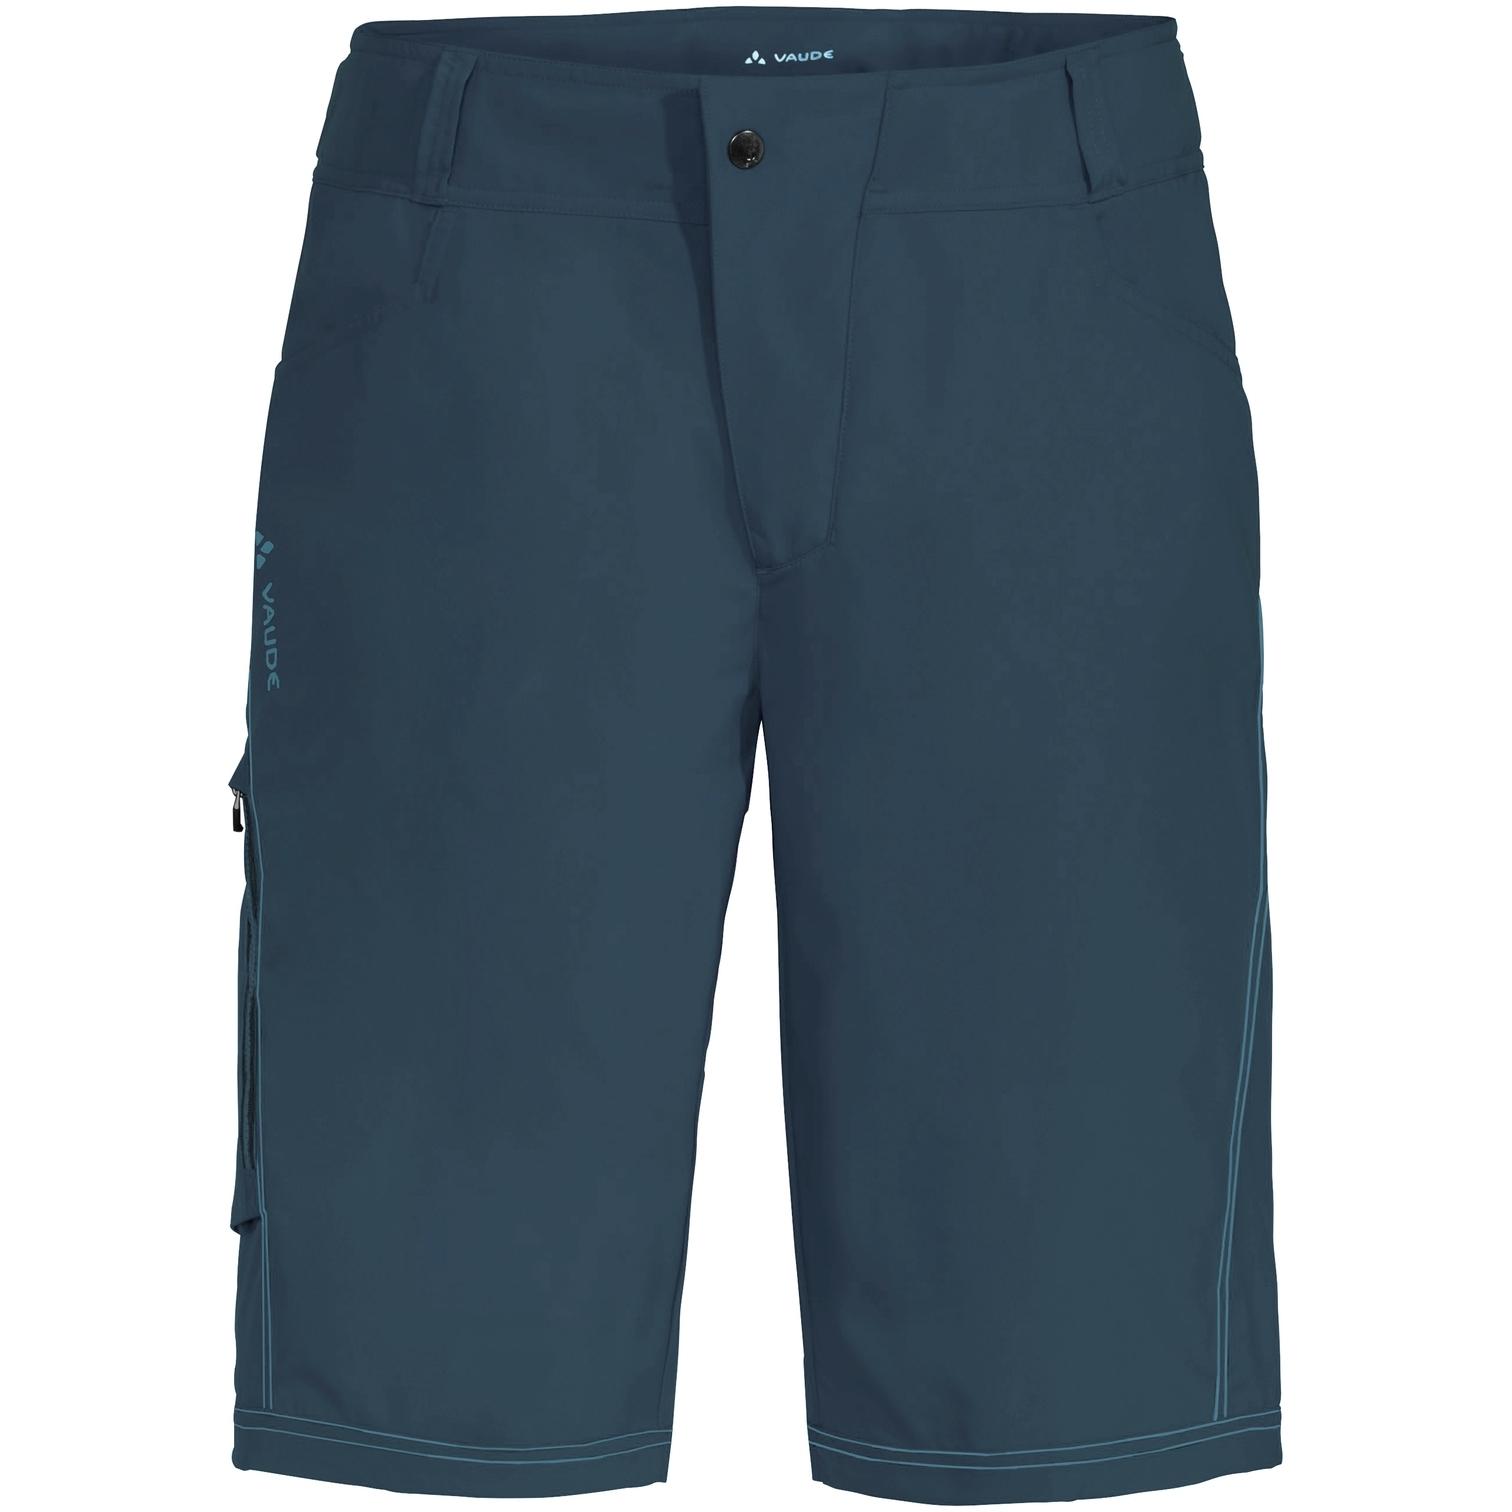 Vaude Ledro Shorts - steelblue